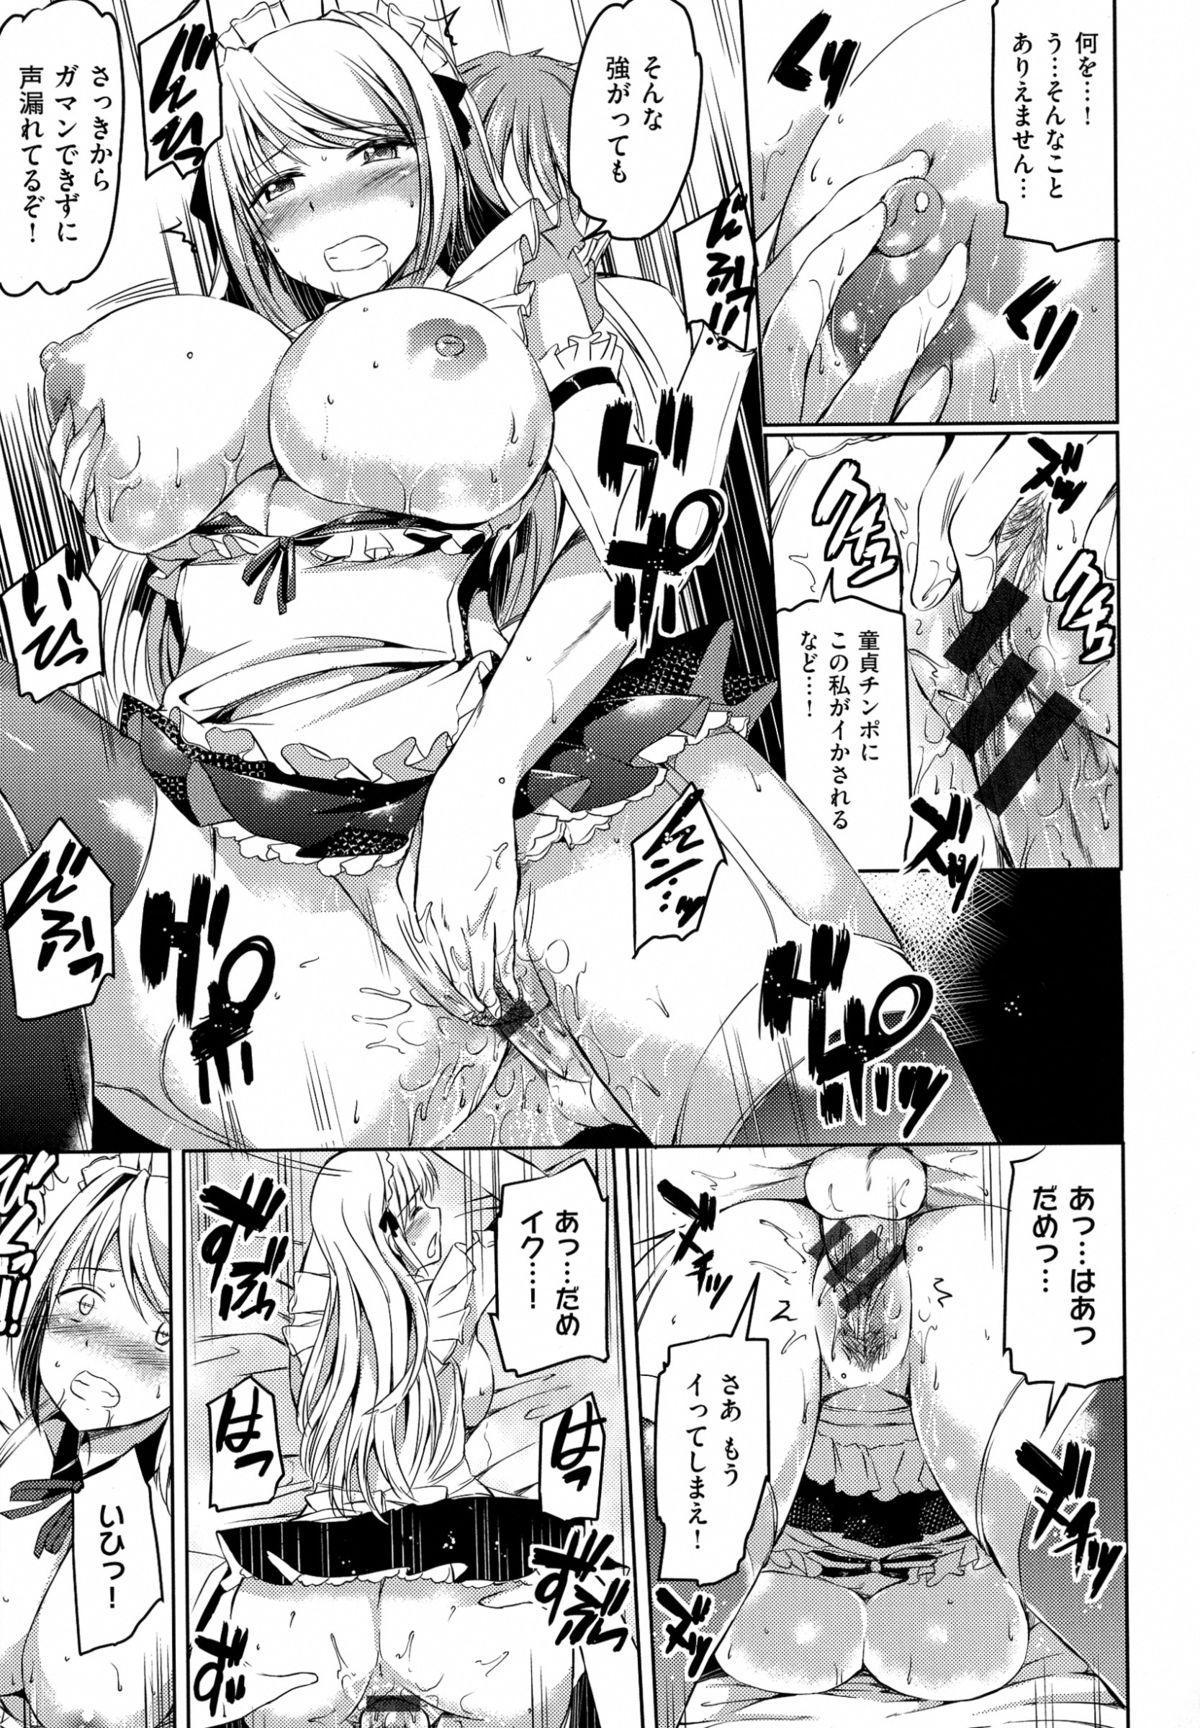 Ojousama no Maid Jijou 52